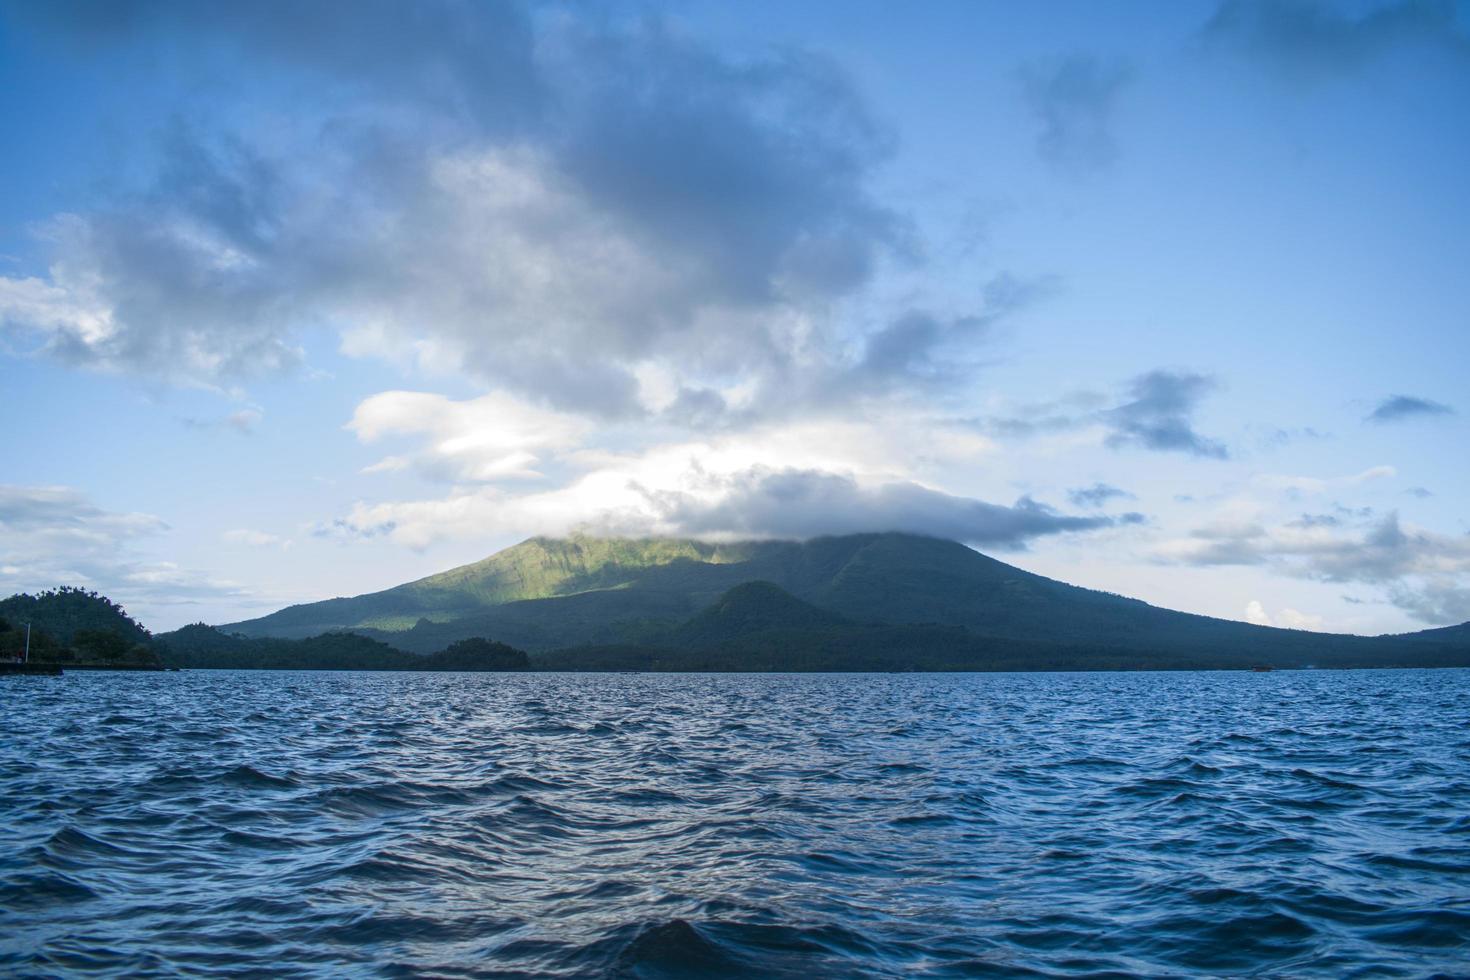 oceano vicino alla montagna con le nuvole foto